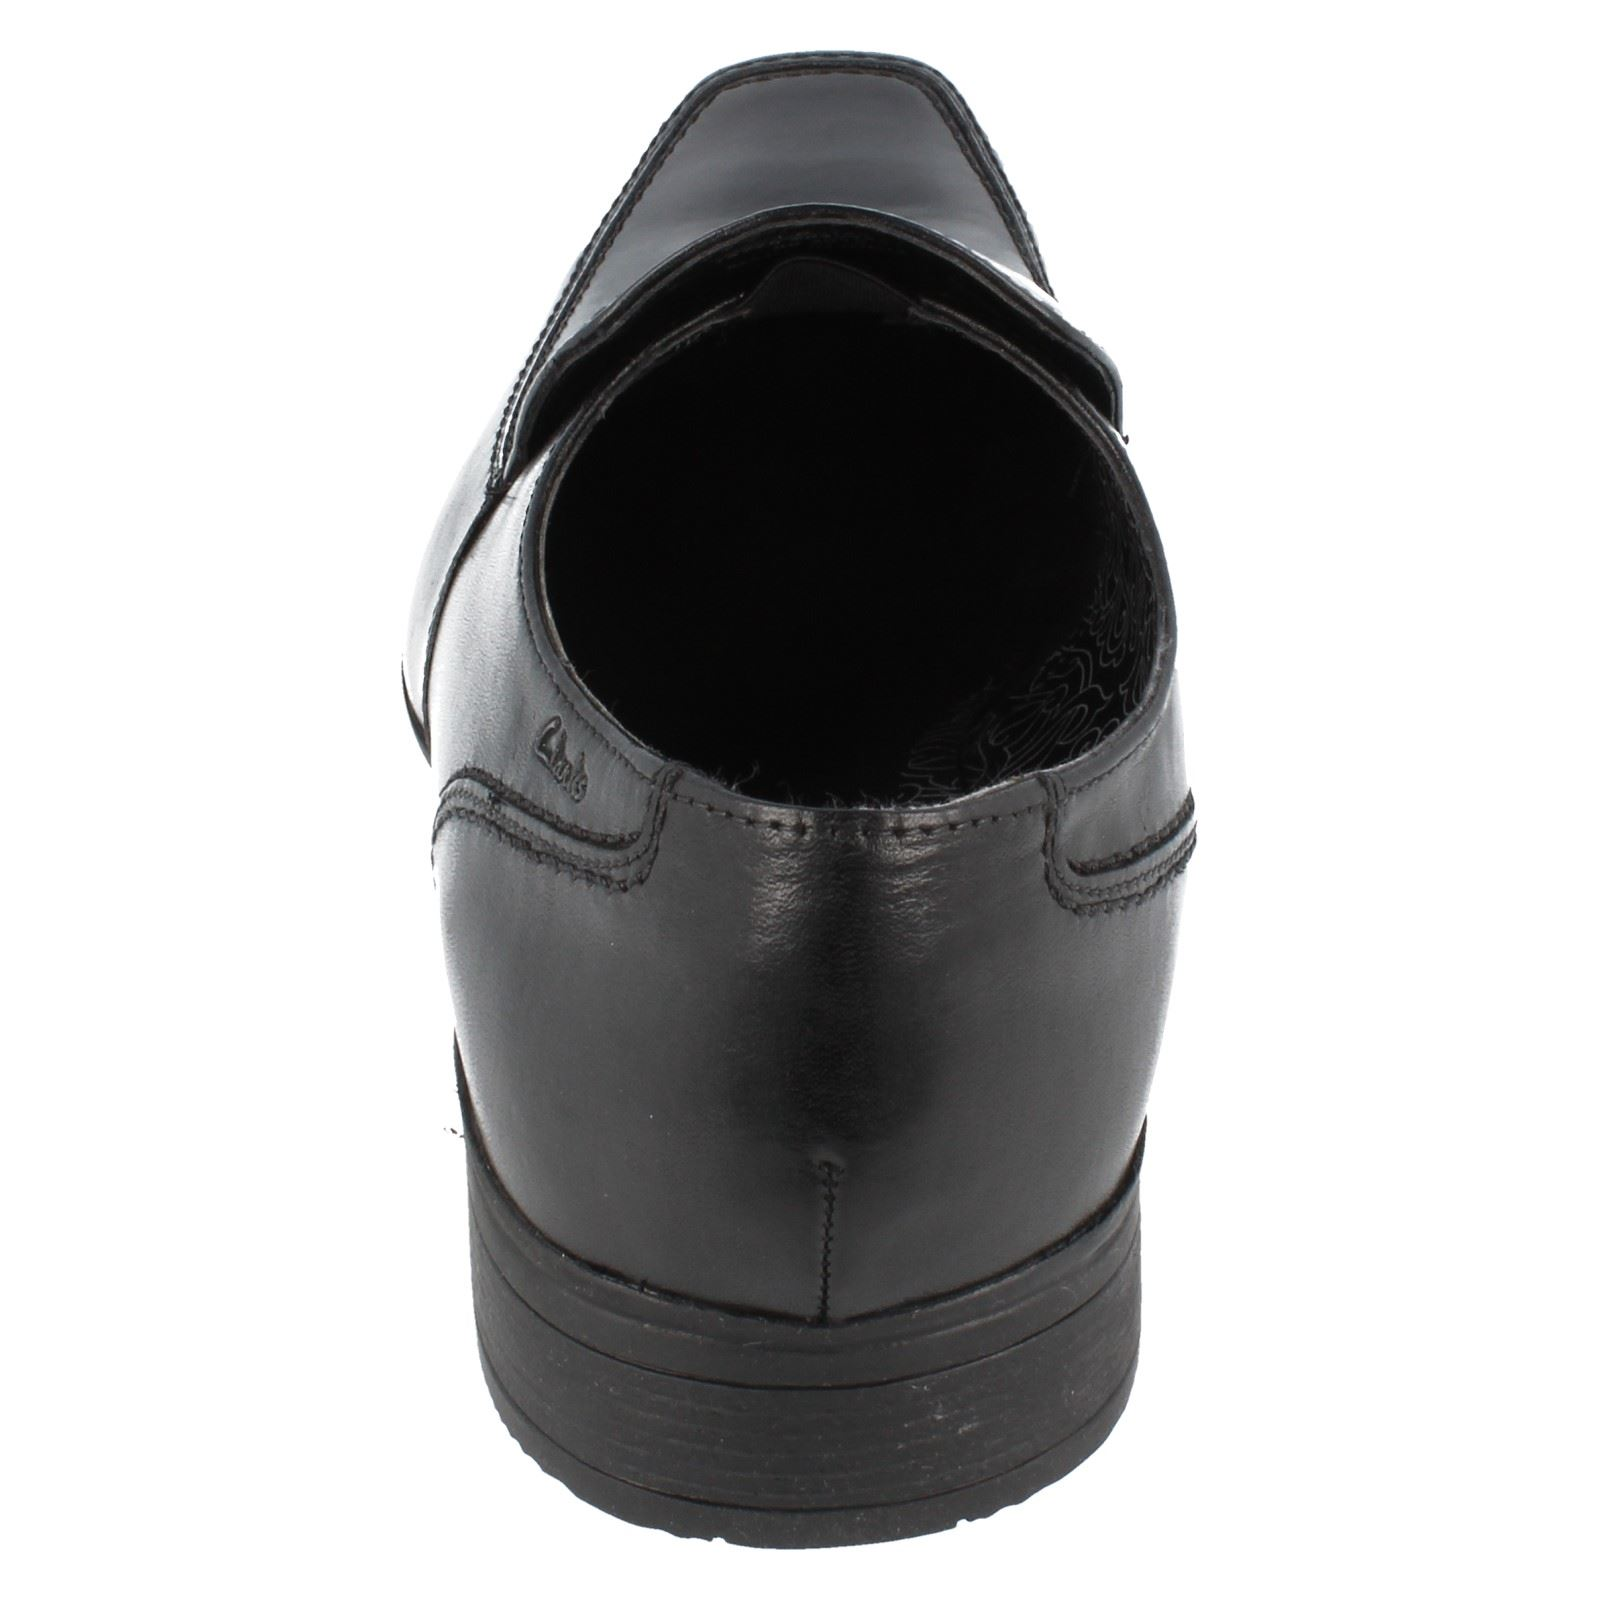 Zapatos para Hombre Clarks Slip On Label Aze noche ~ N